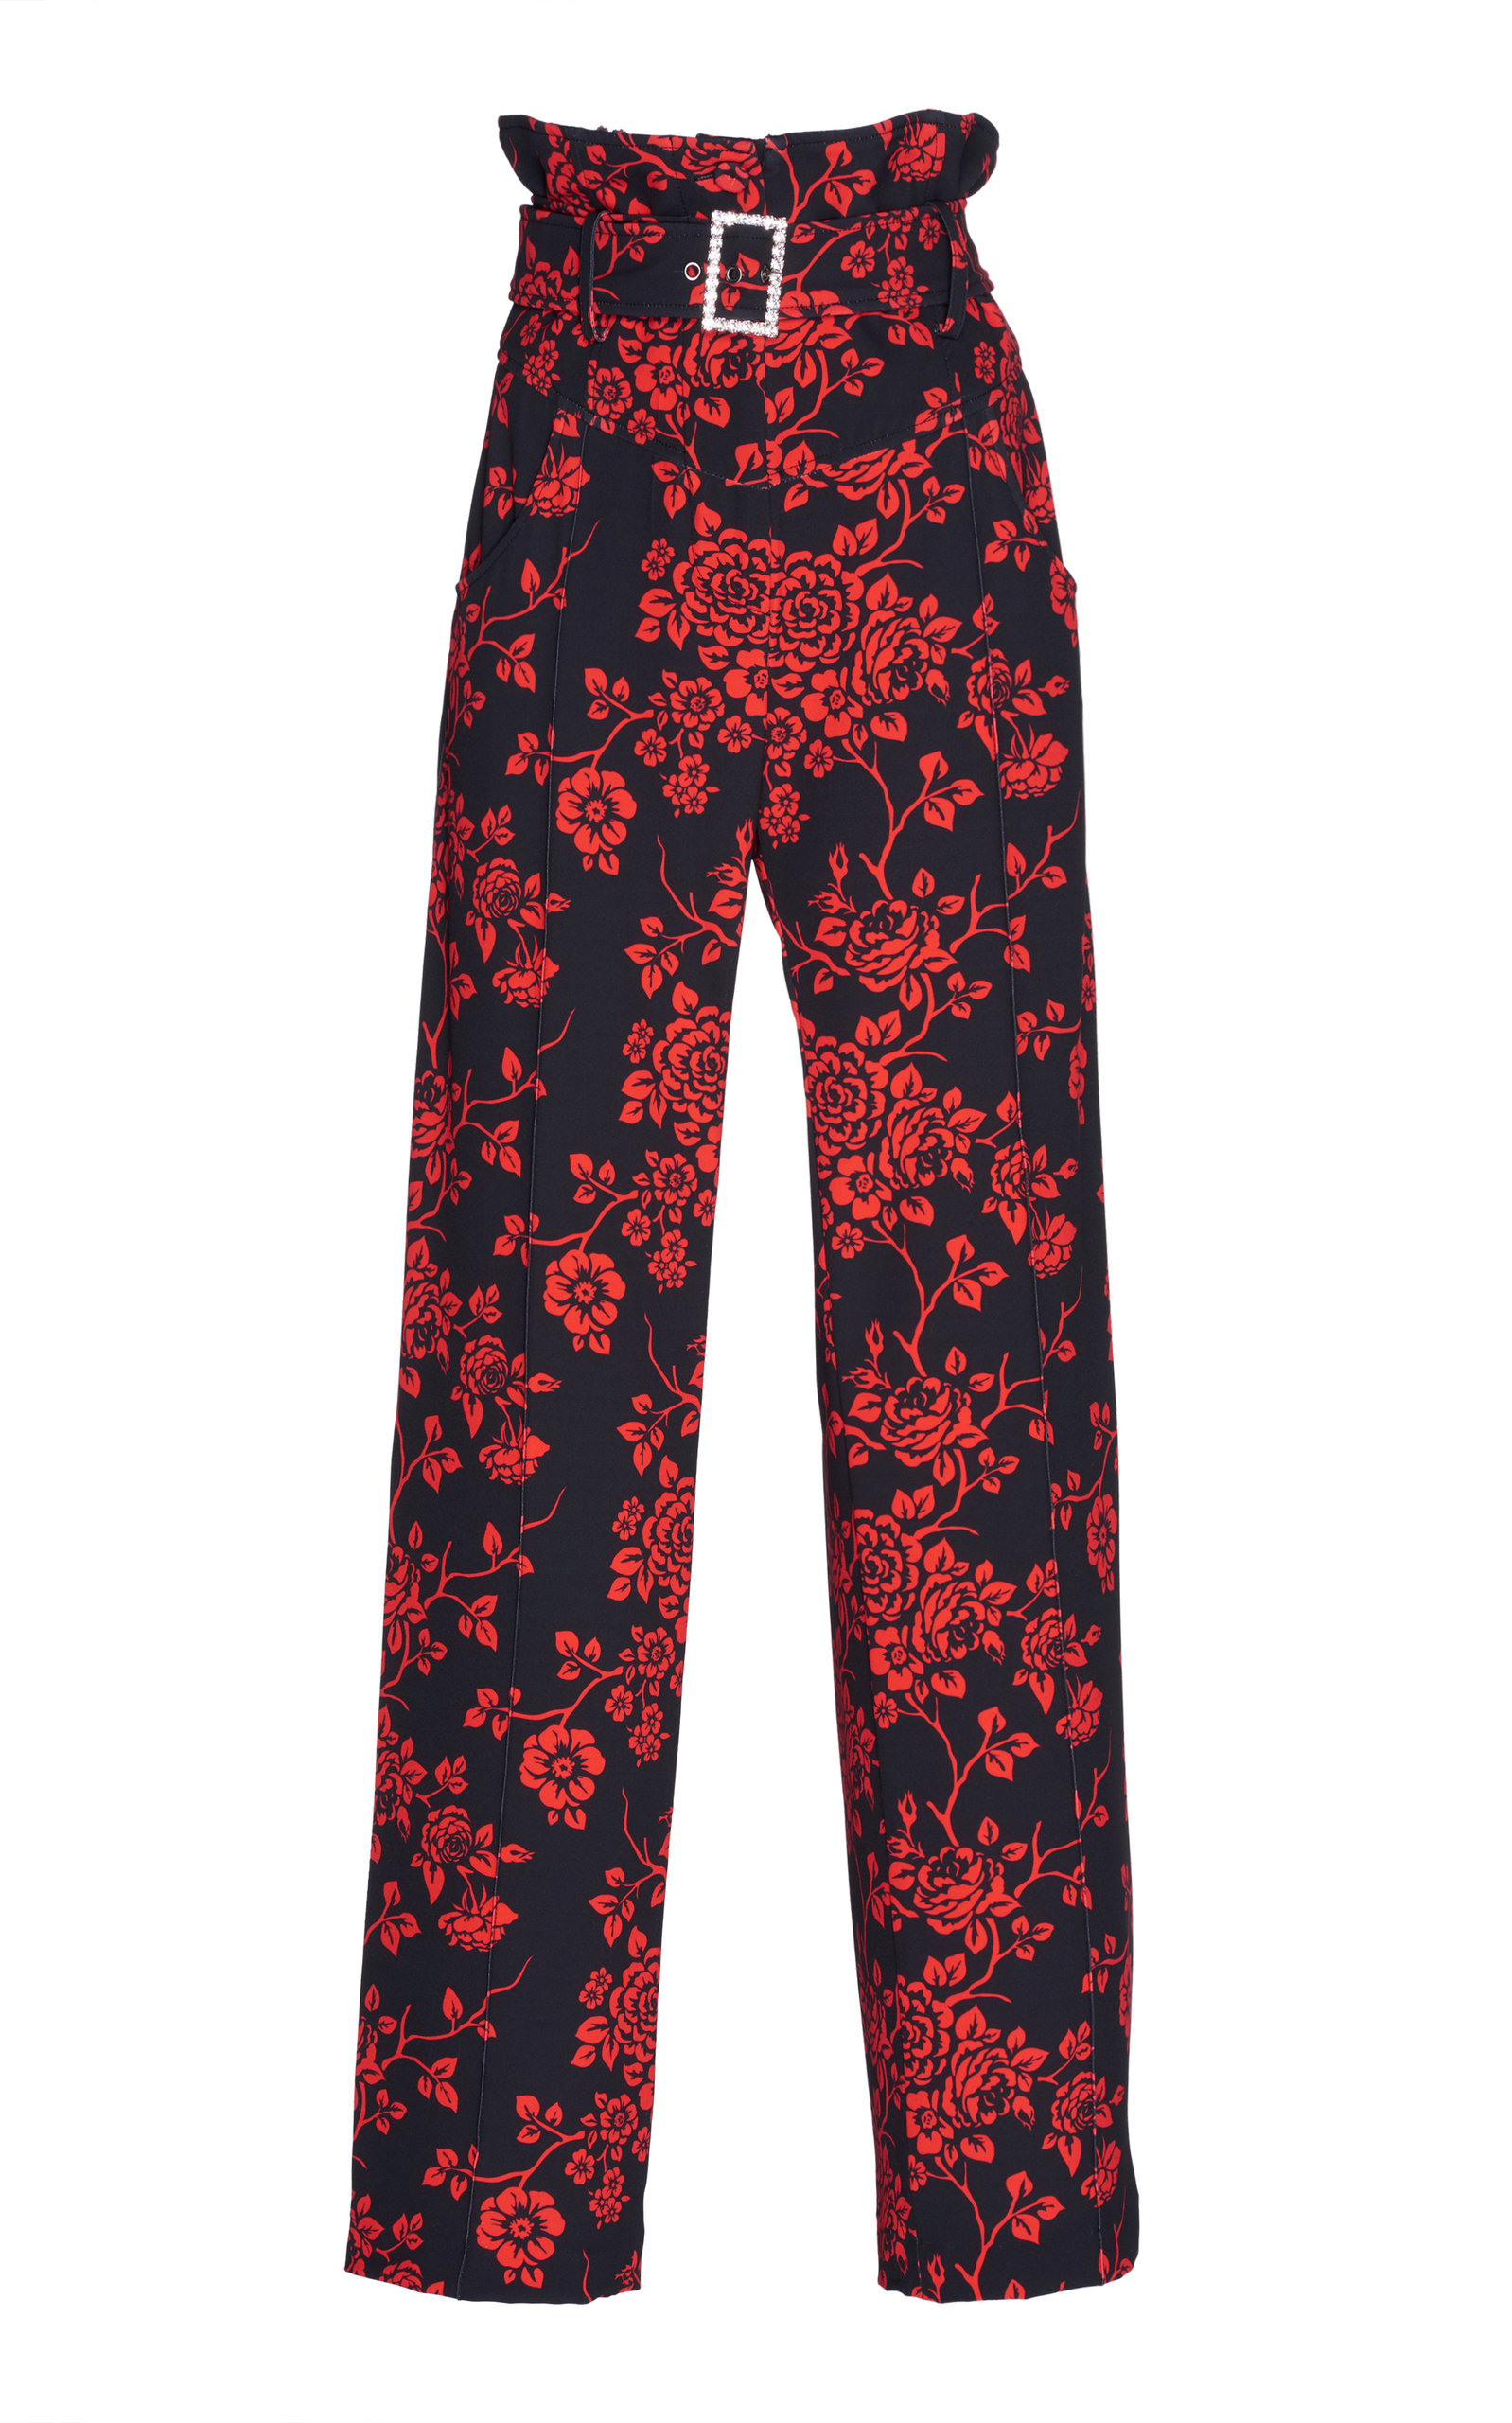 GIUSEPPE DI MORABITO Printed Cady Trouser in Floral